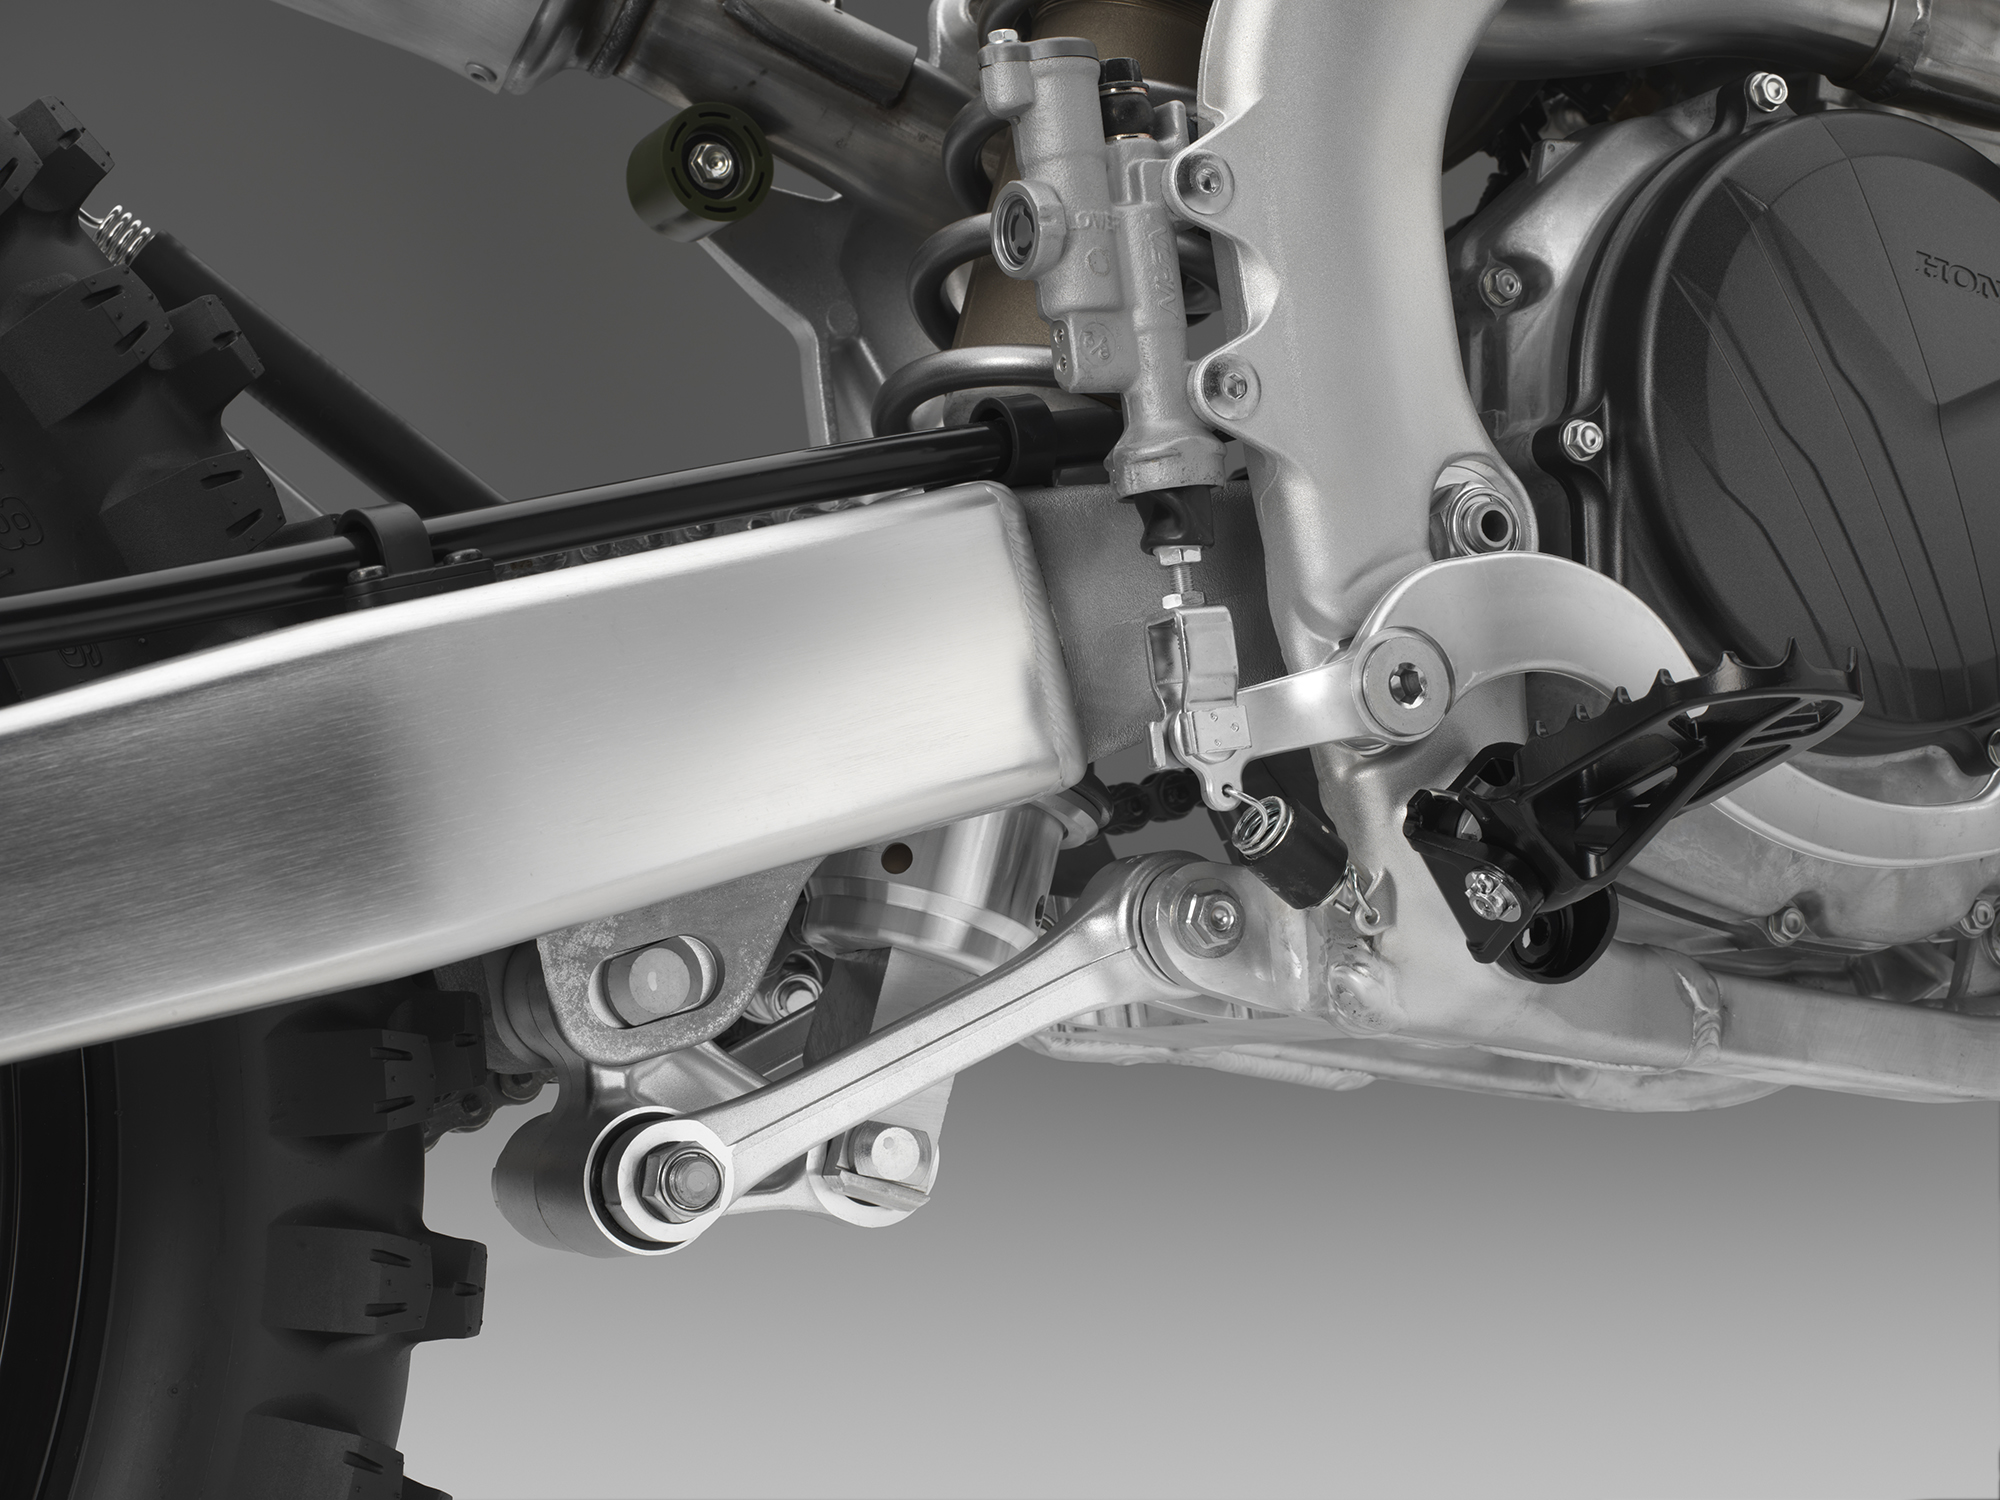 19 Honda CRF450RX_linkage.jpg